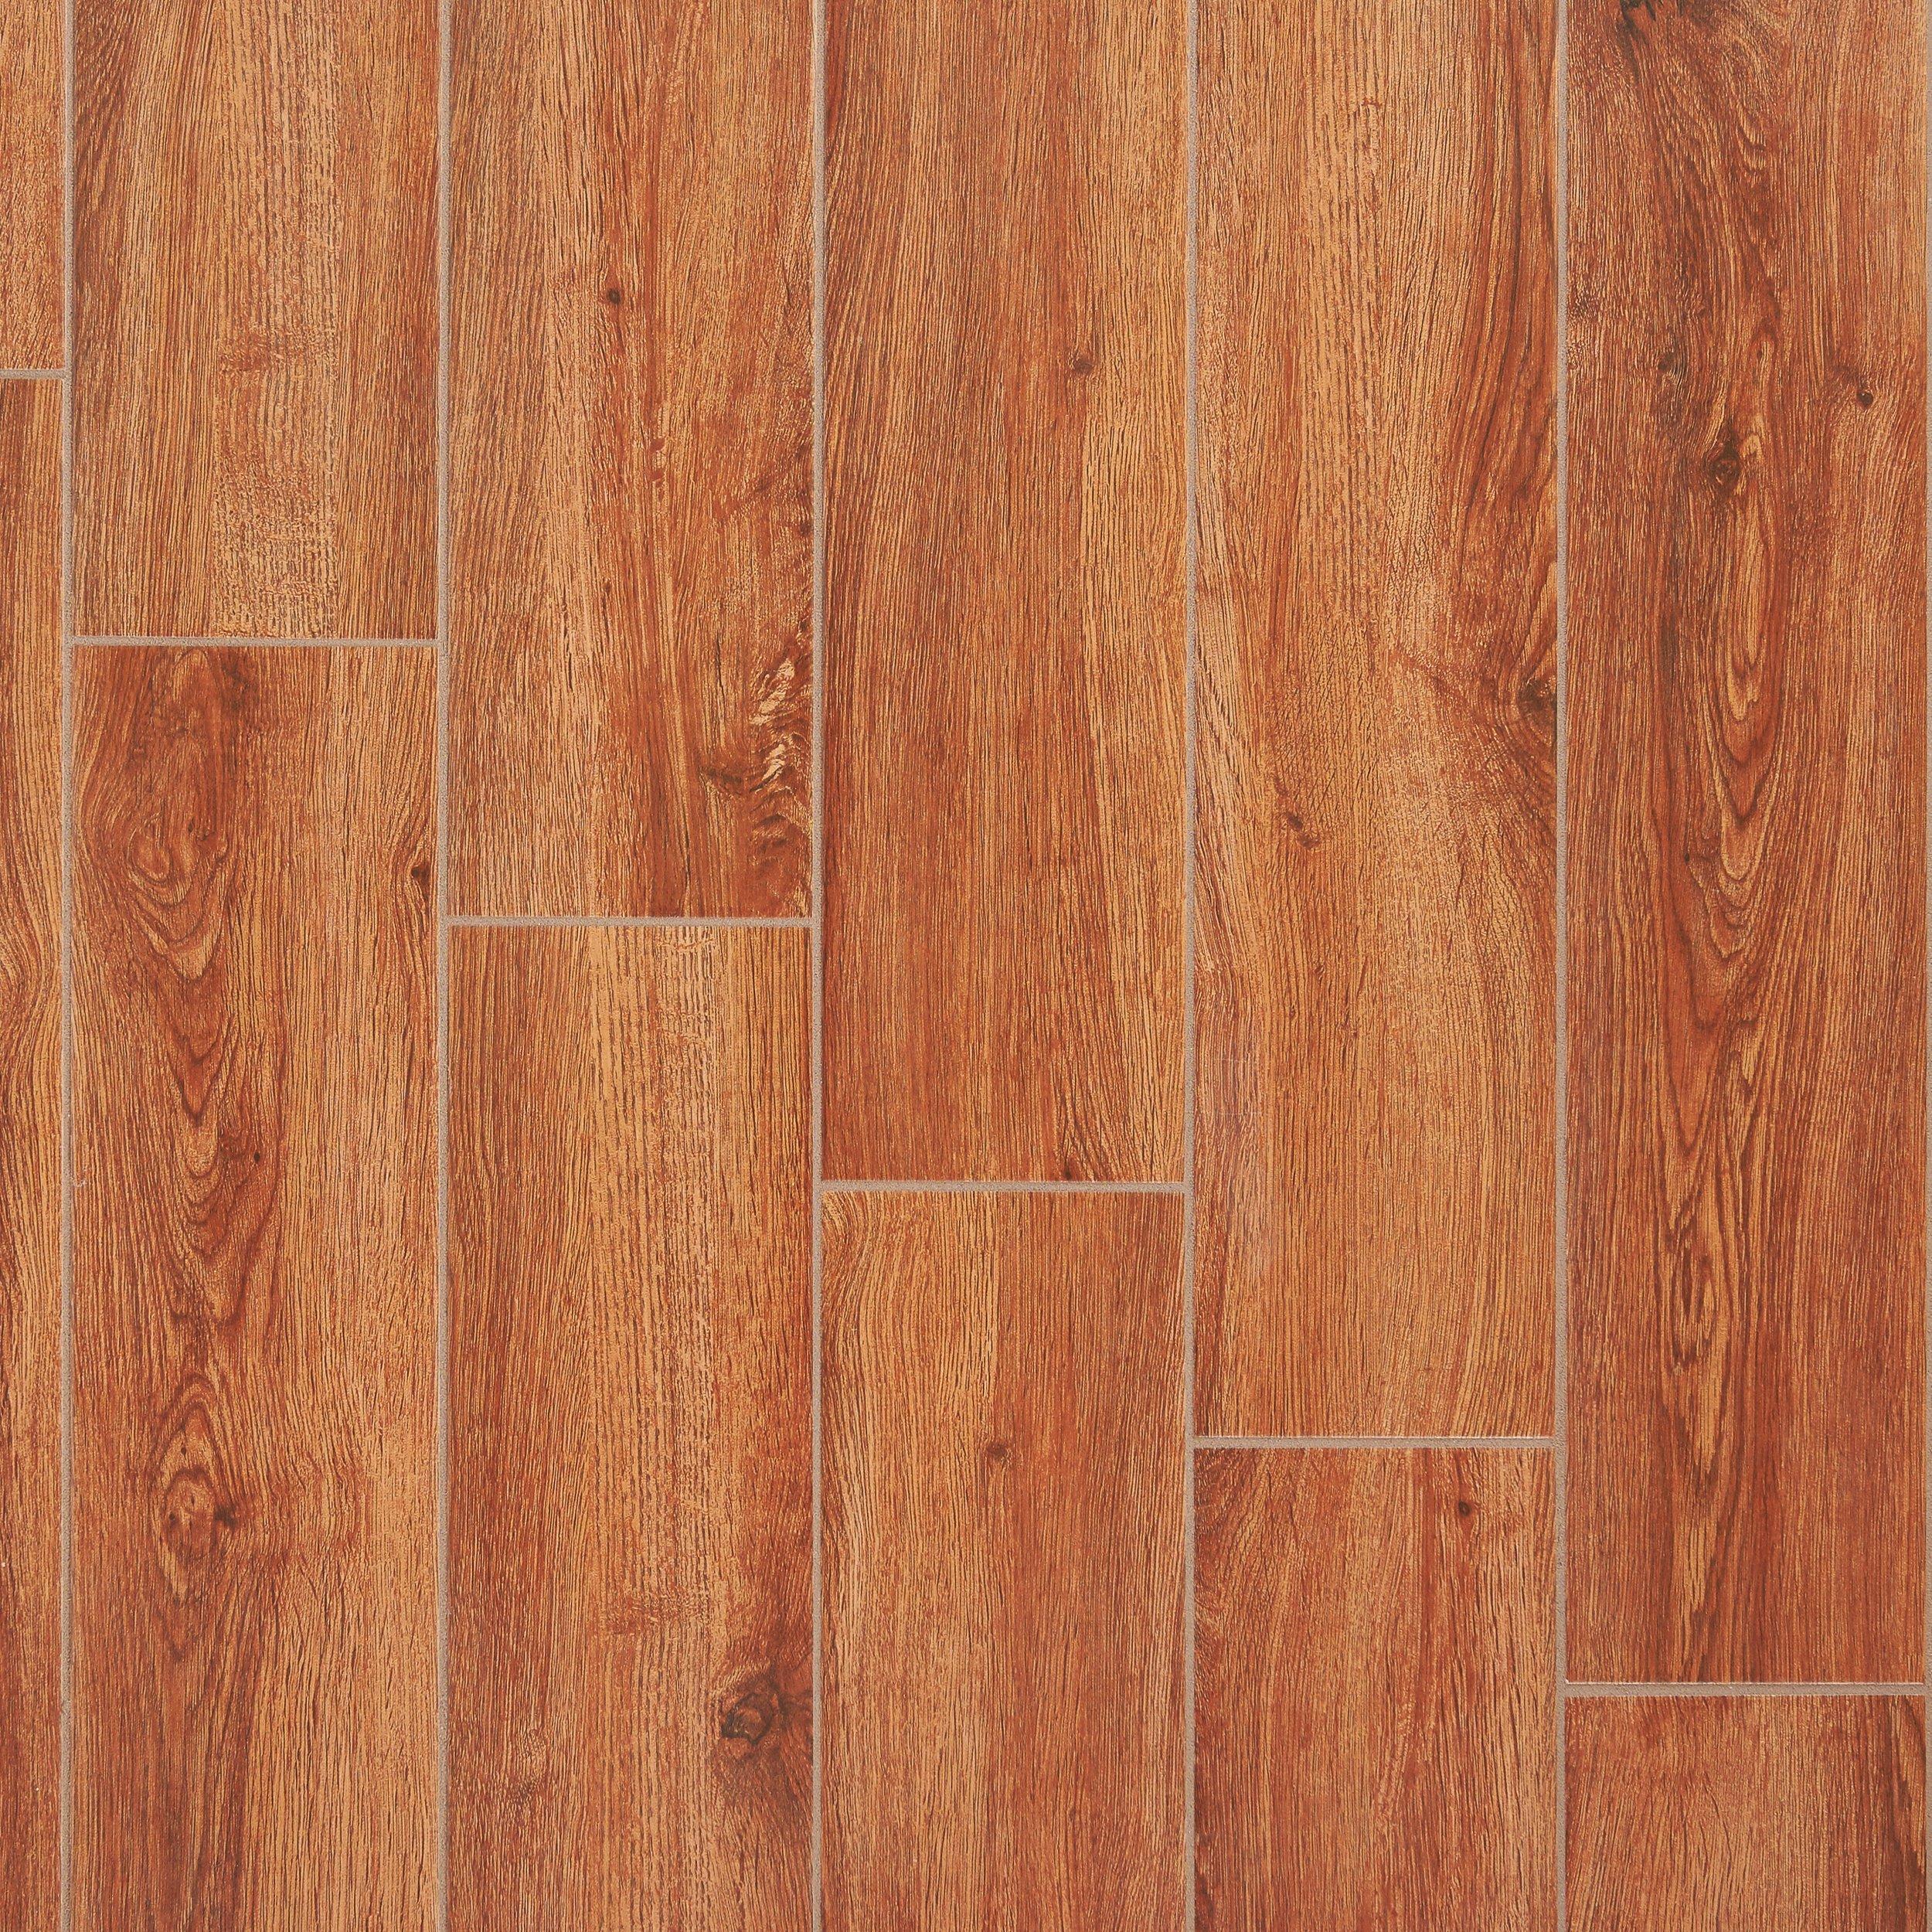 Fulham Red Wood Plank Ceramic Tile 6 X 32 100387968 Floor